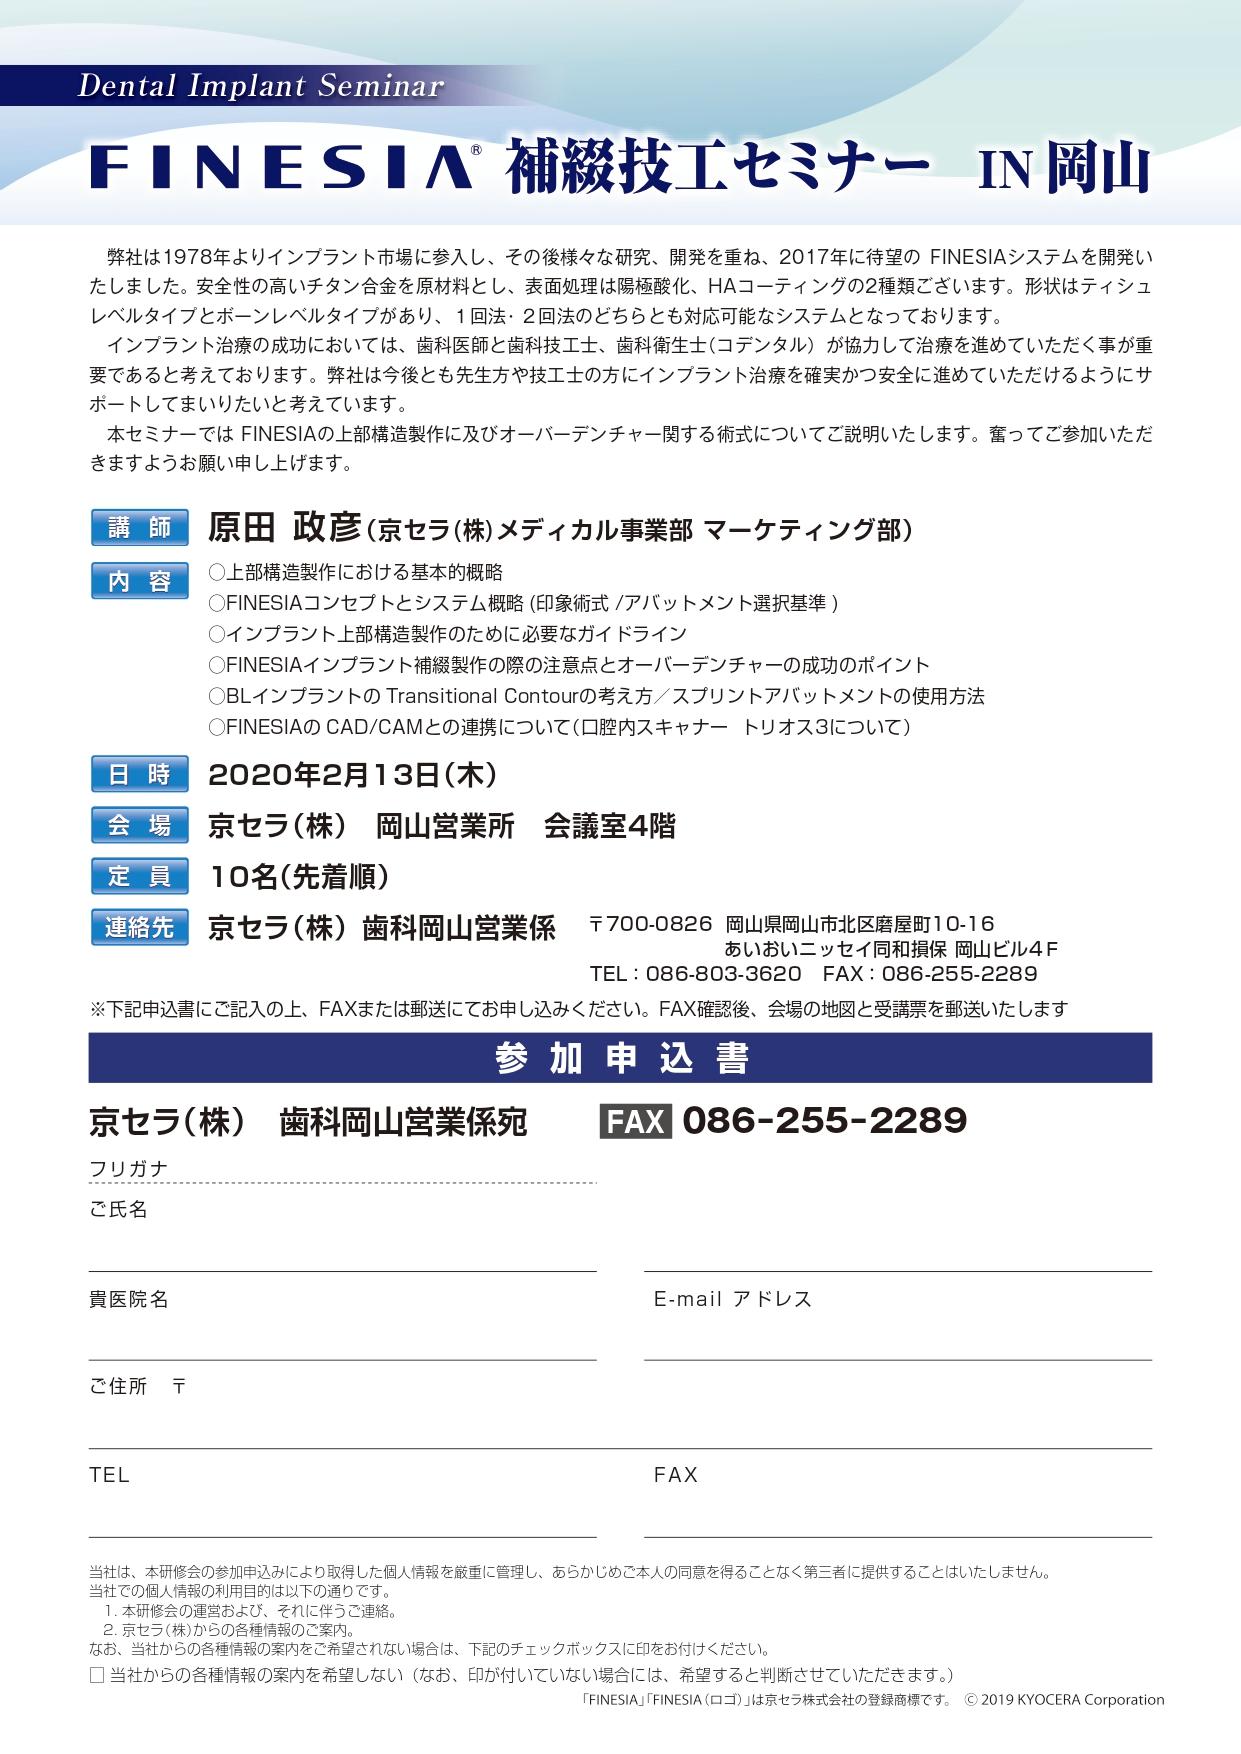 【参加費無料】FINESIA 補綴技工セミナー IN 岡山